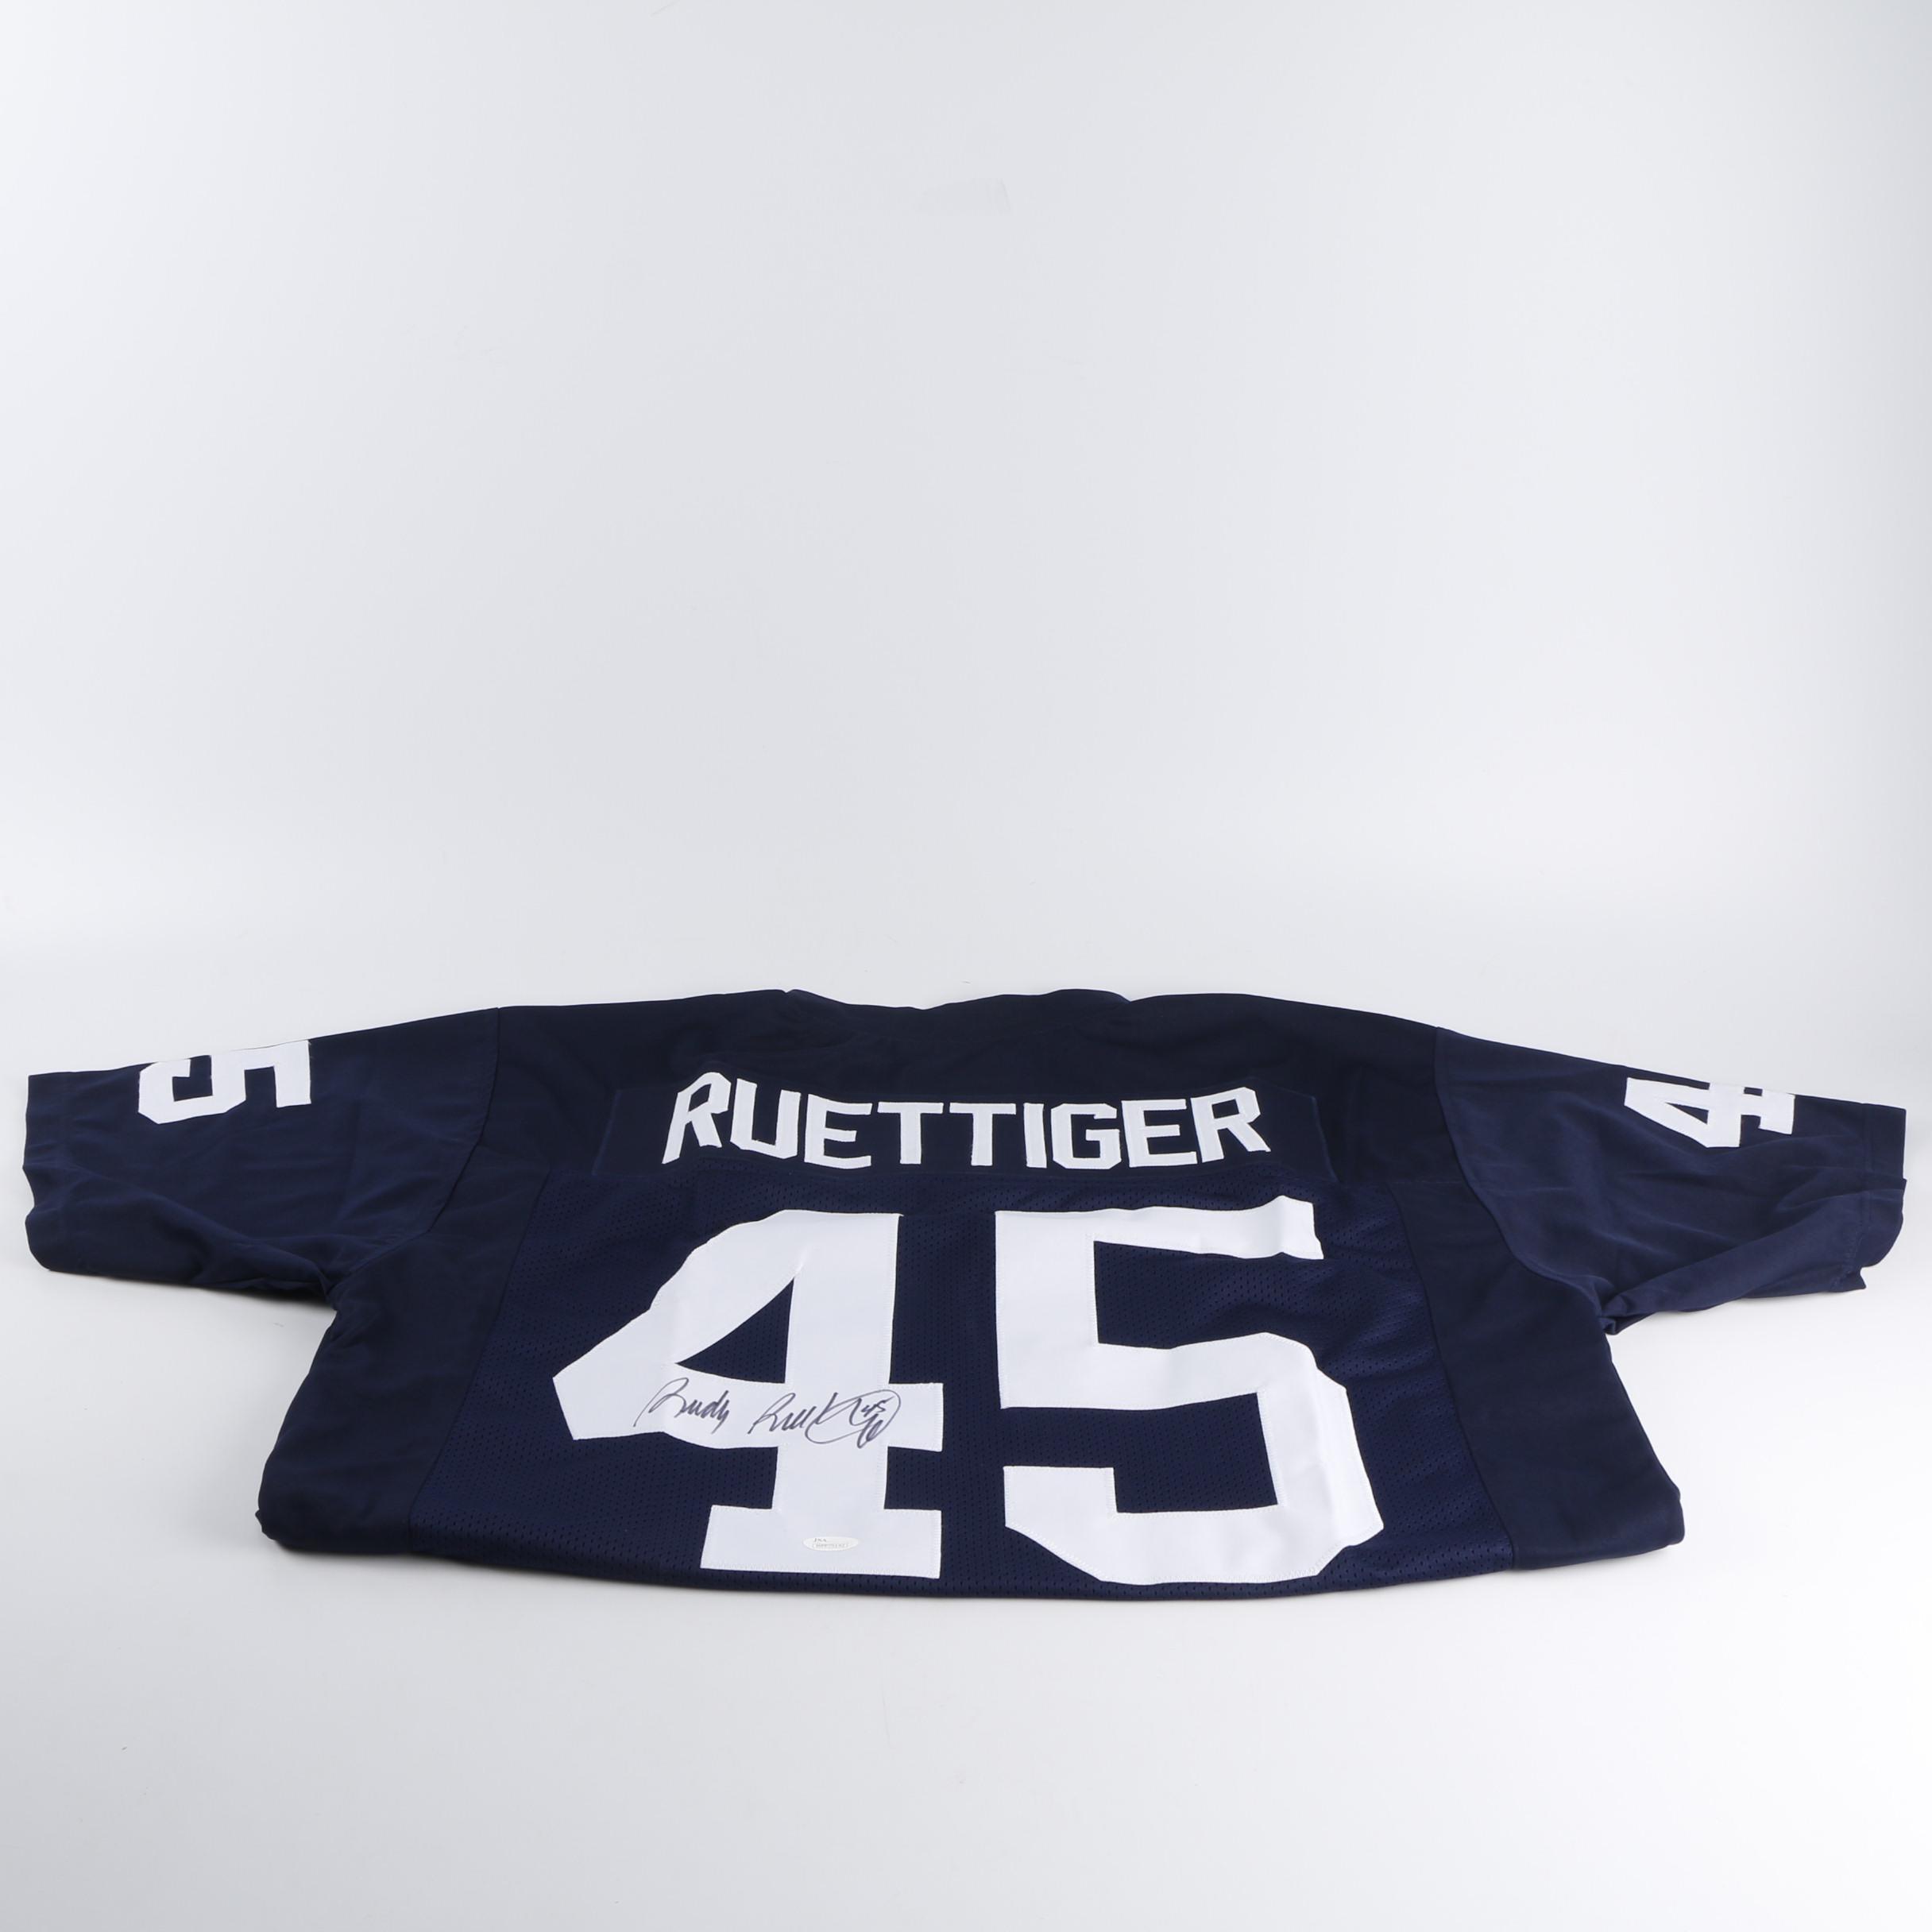 Rudy Ruettiger Autographed Notre Dame Jersey - JSA COA